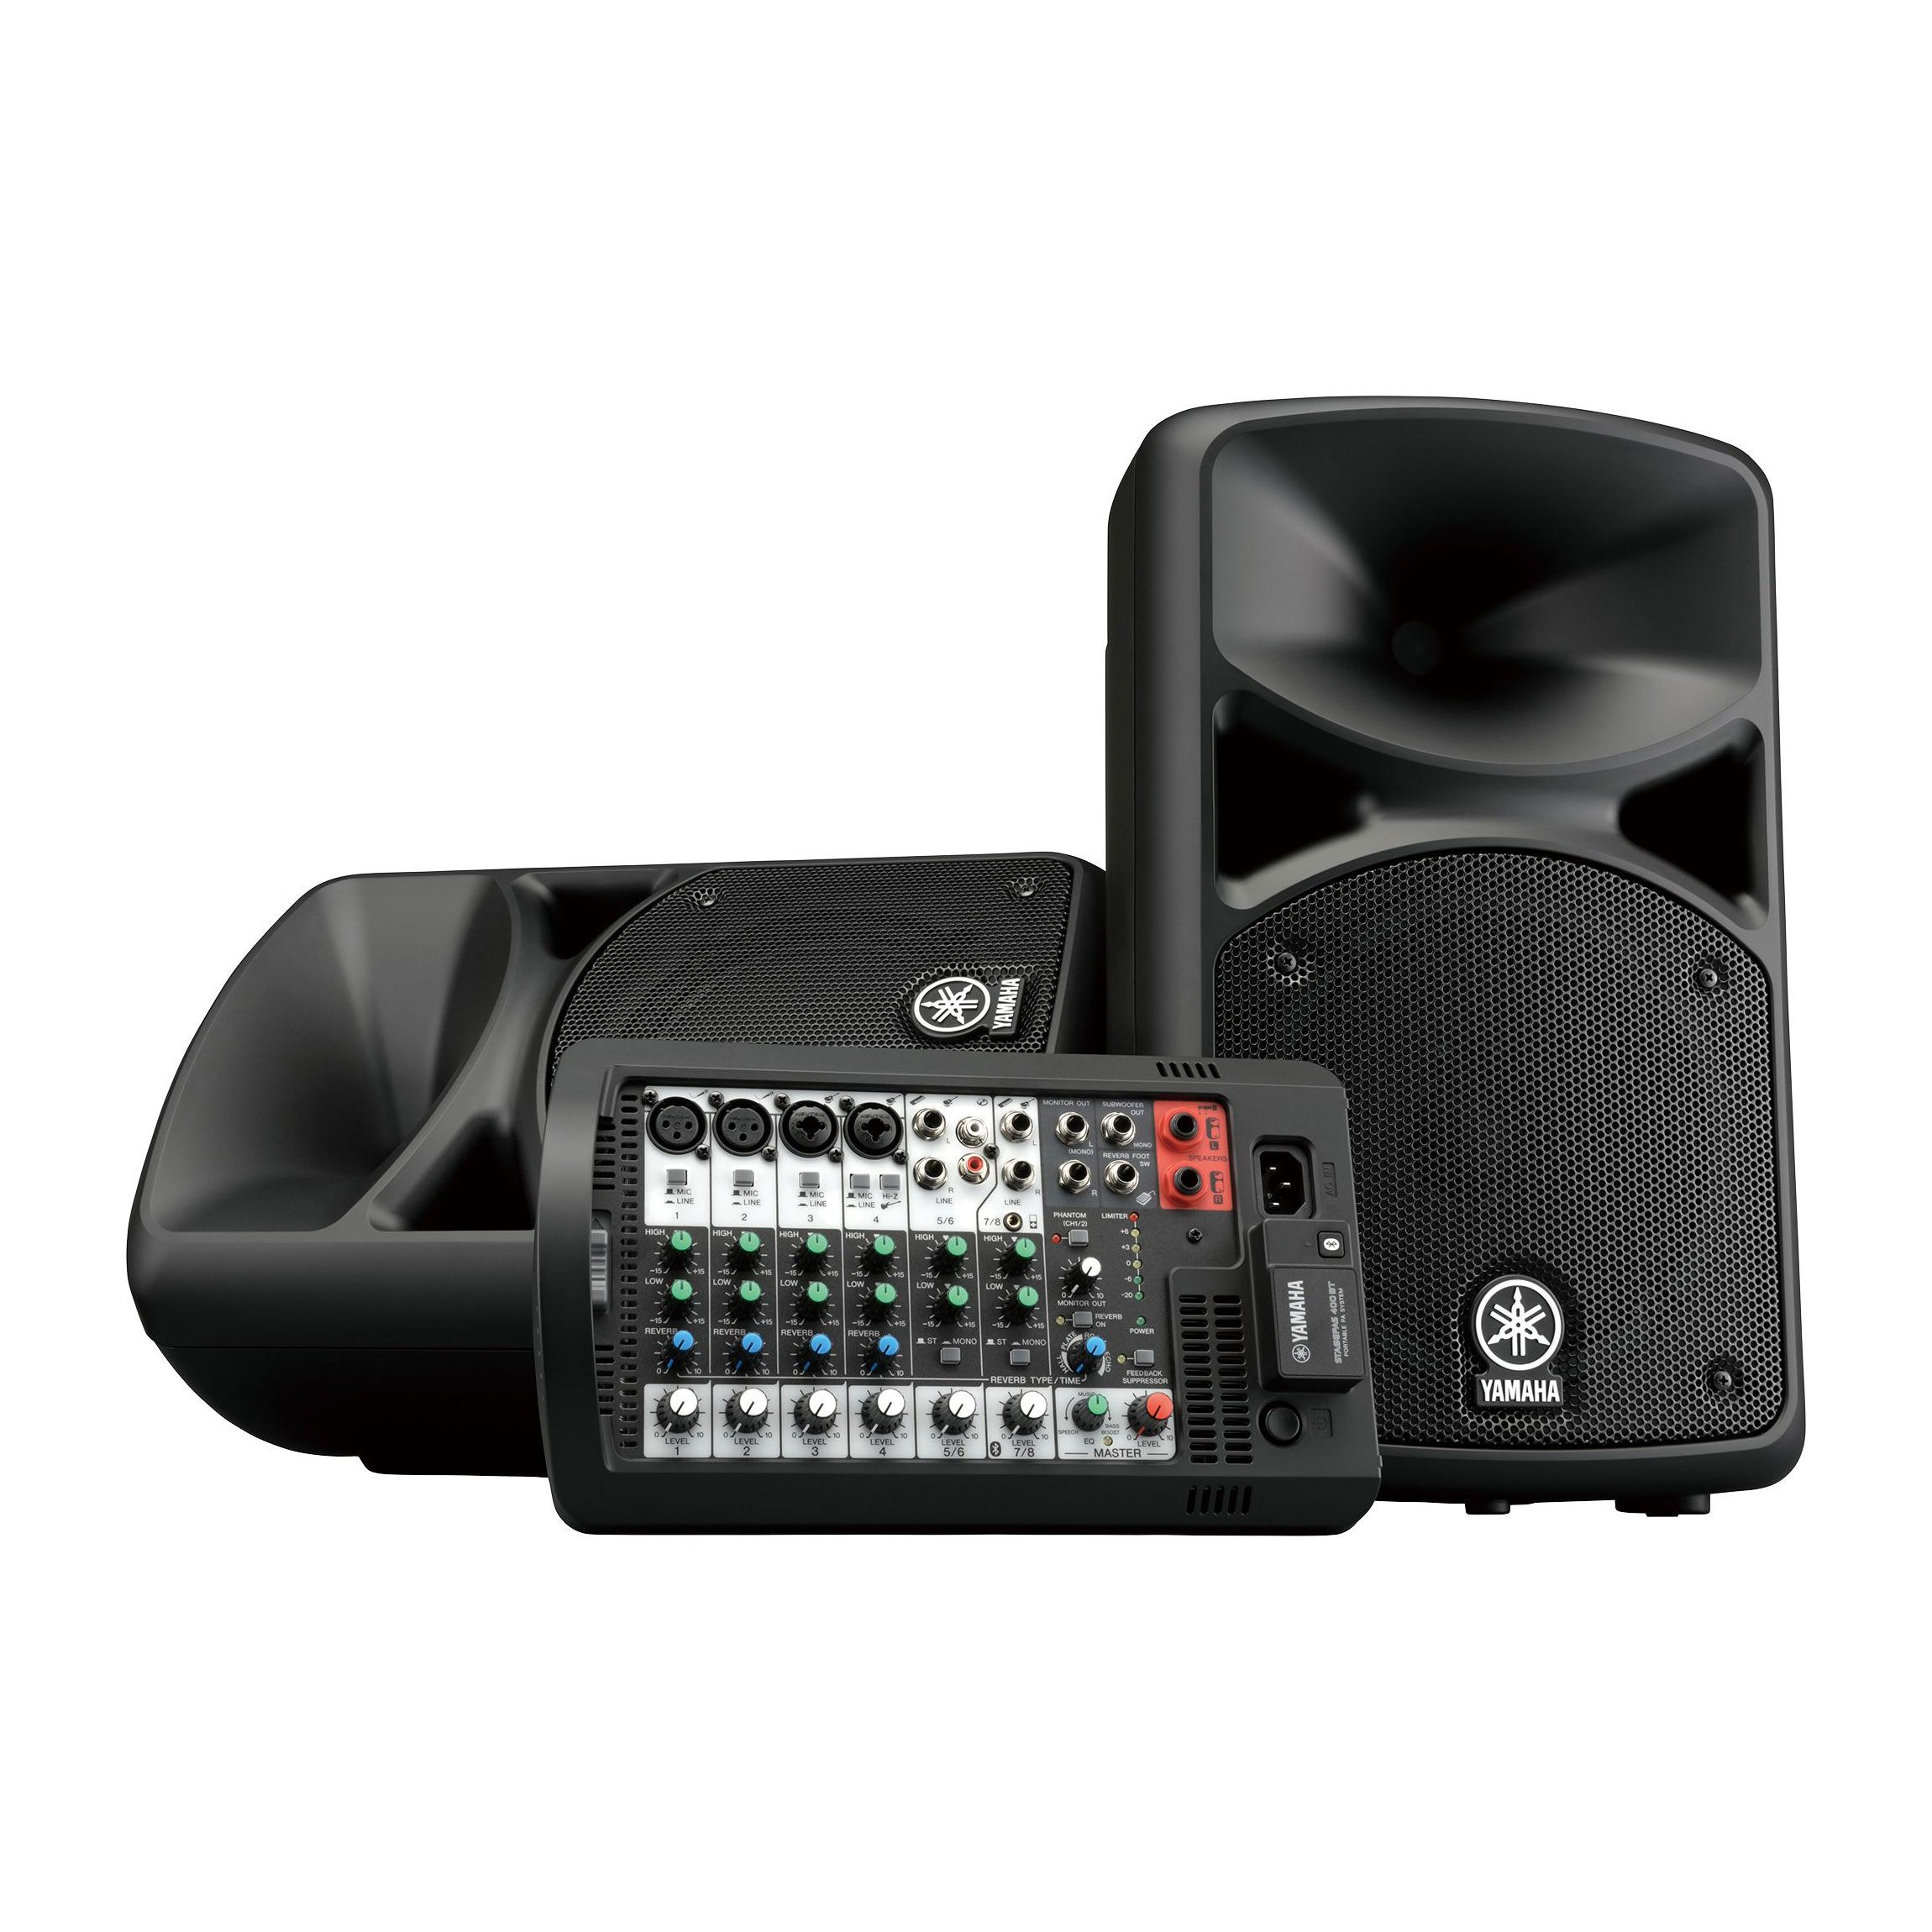 Yamaha - Système de sonorisation compact - Stagepass 400BT